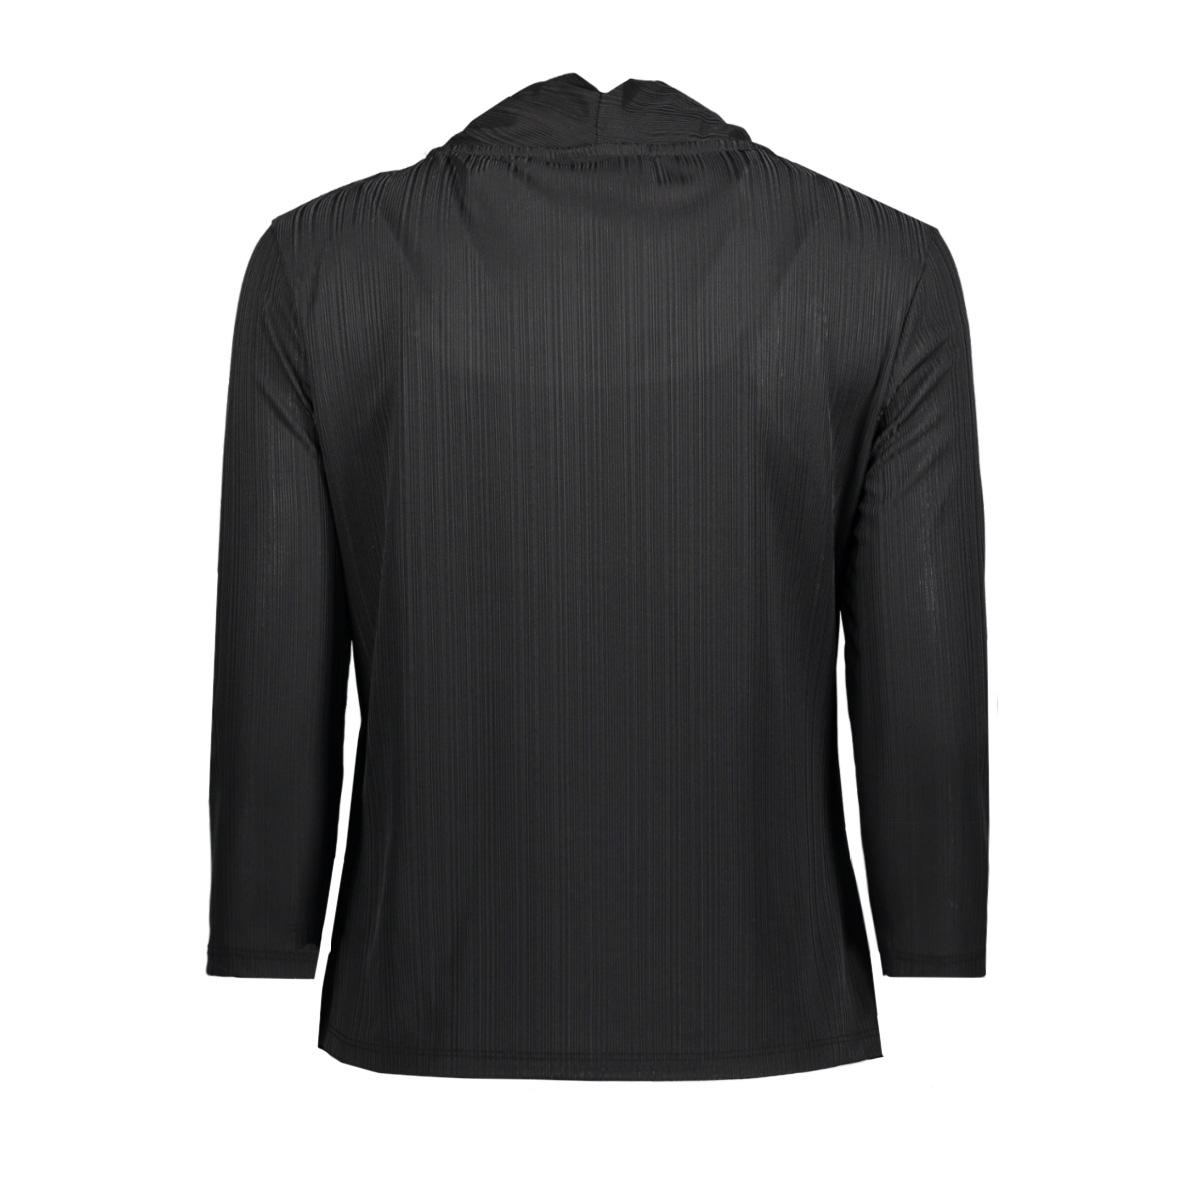 objcosma 3/4 top 94 23025542 object blouse black